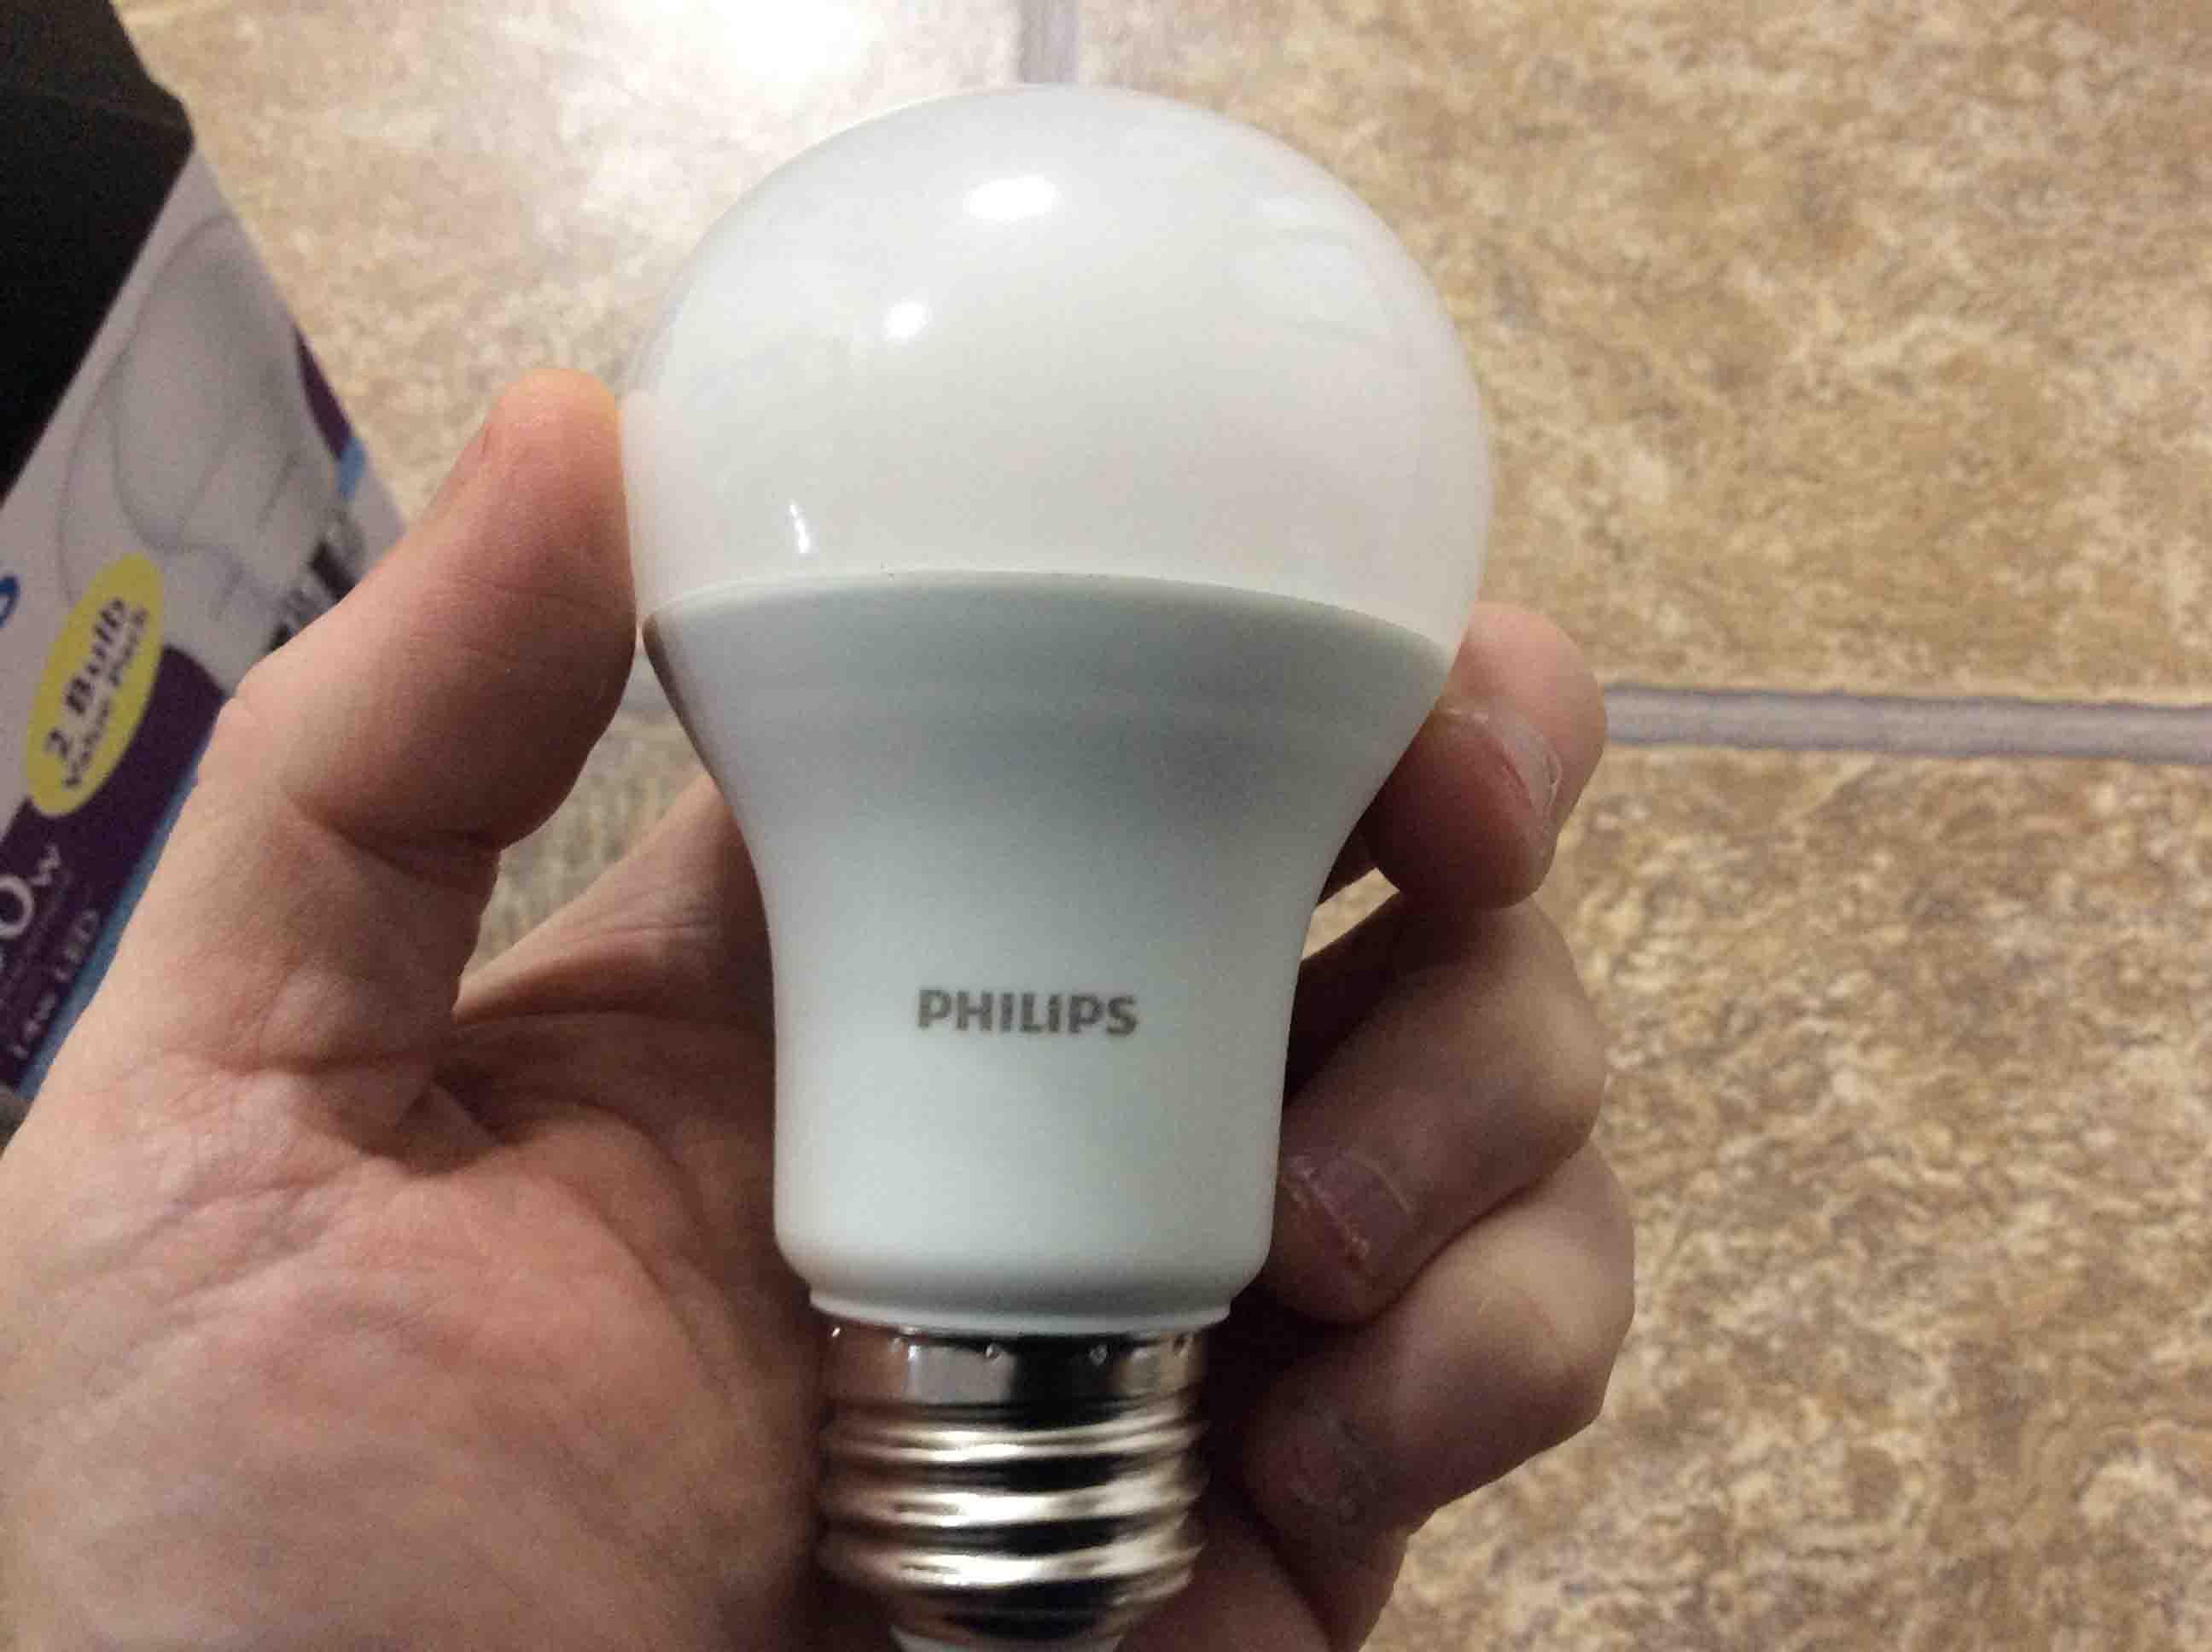 PhilipsLED100wA19DaylightWhiteLightBulbHeldInHand_001 Wunderschöne Led Lampen 100 Watt Dekorationen